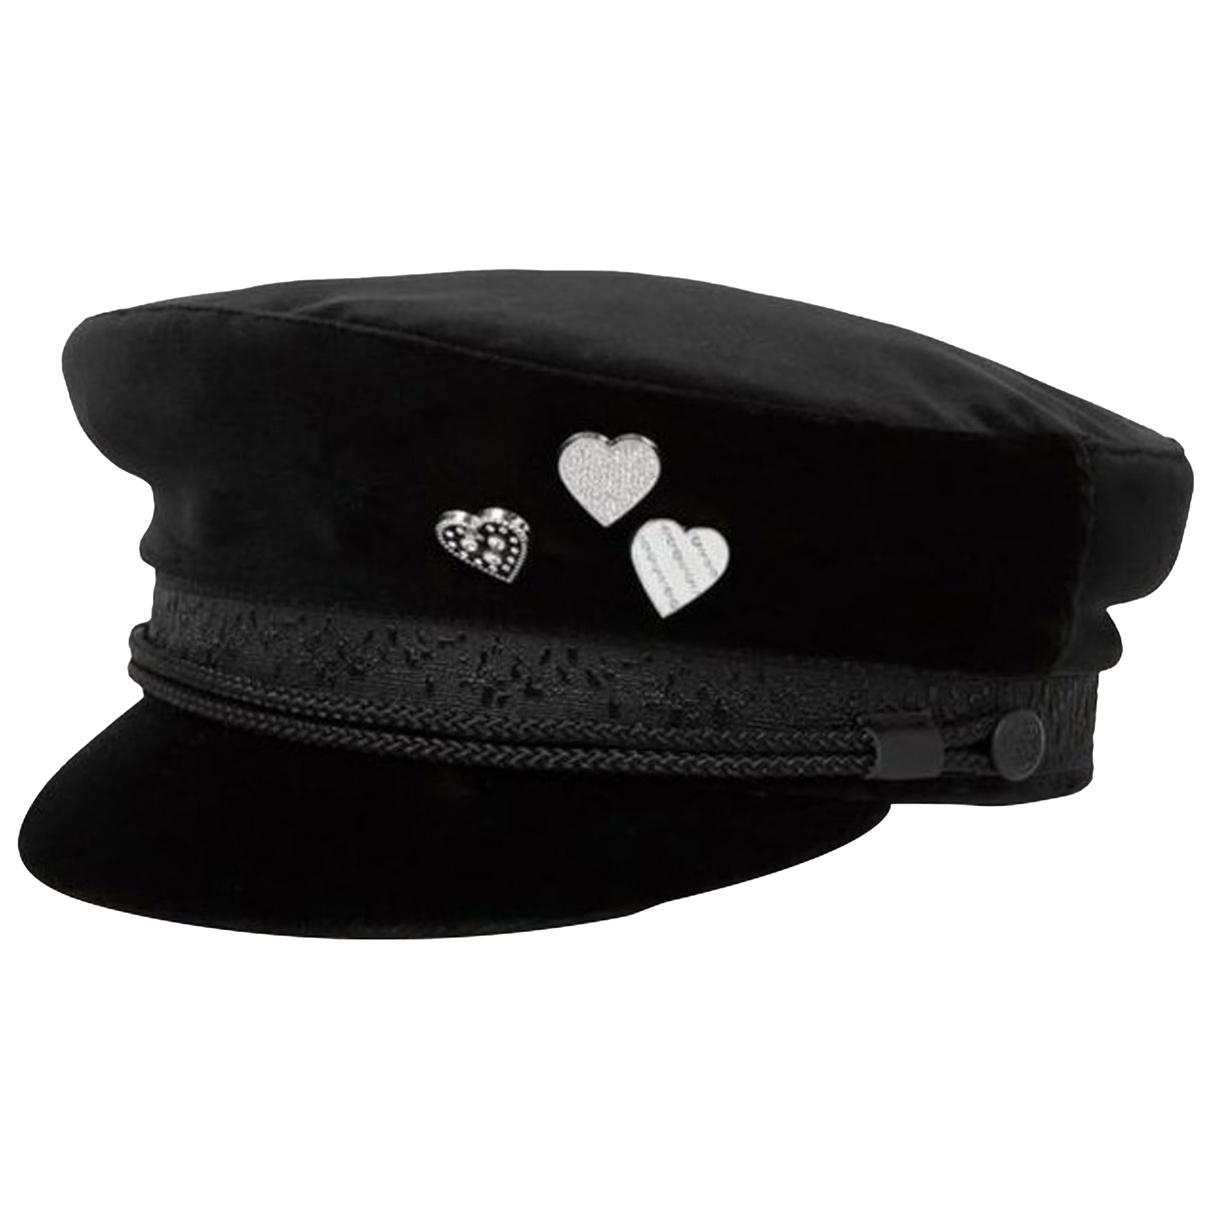 The Kooples N Black Cotton hat for Women 57 cm